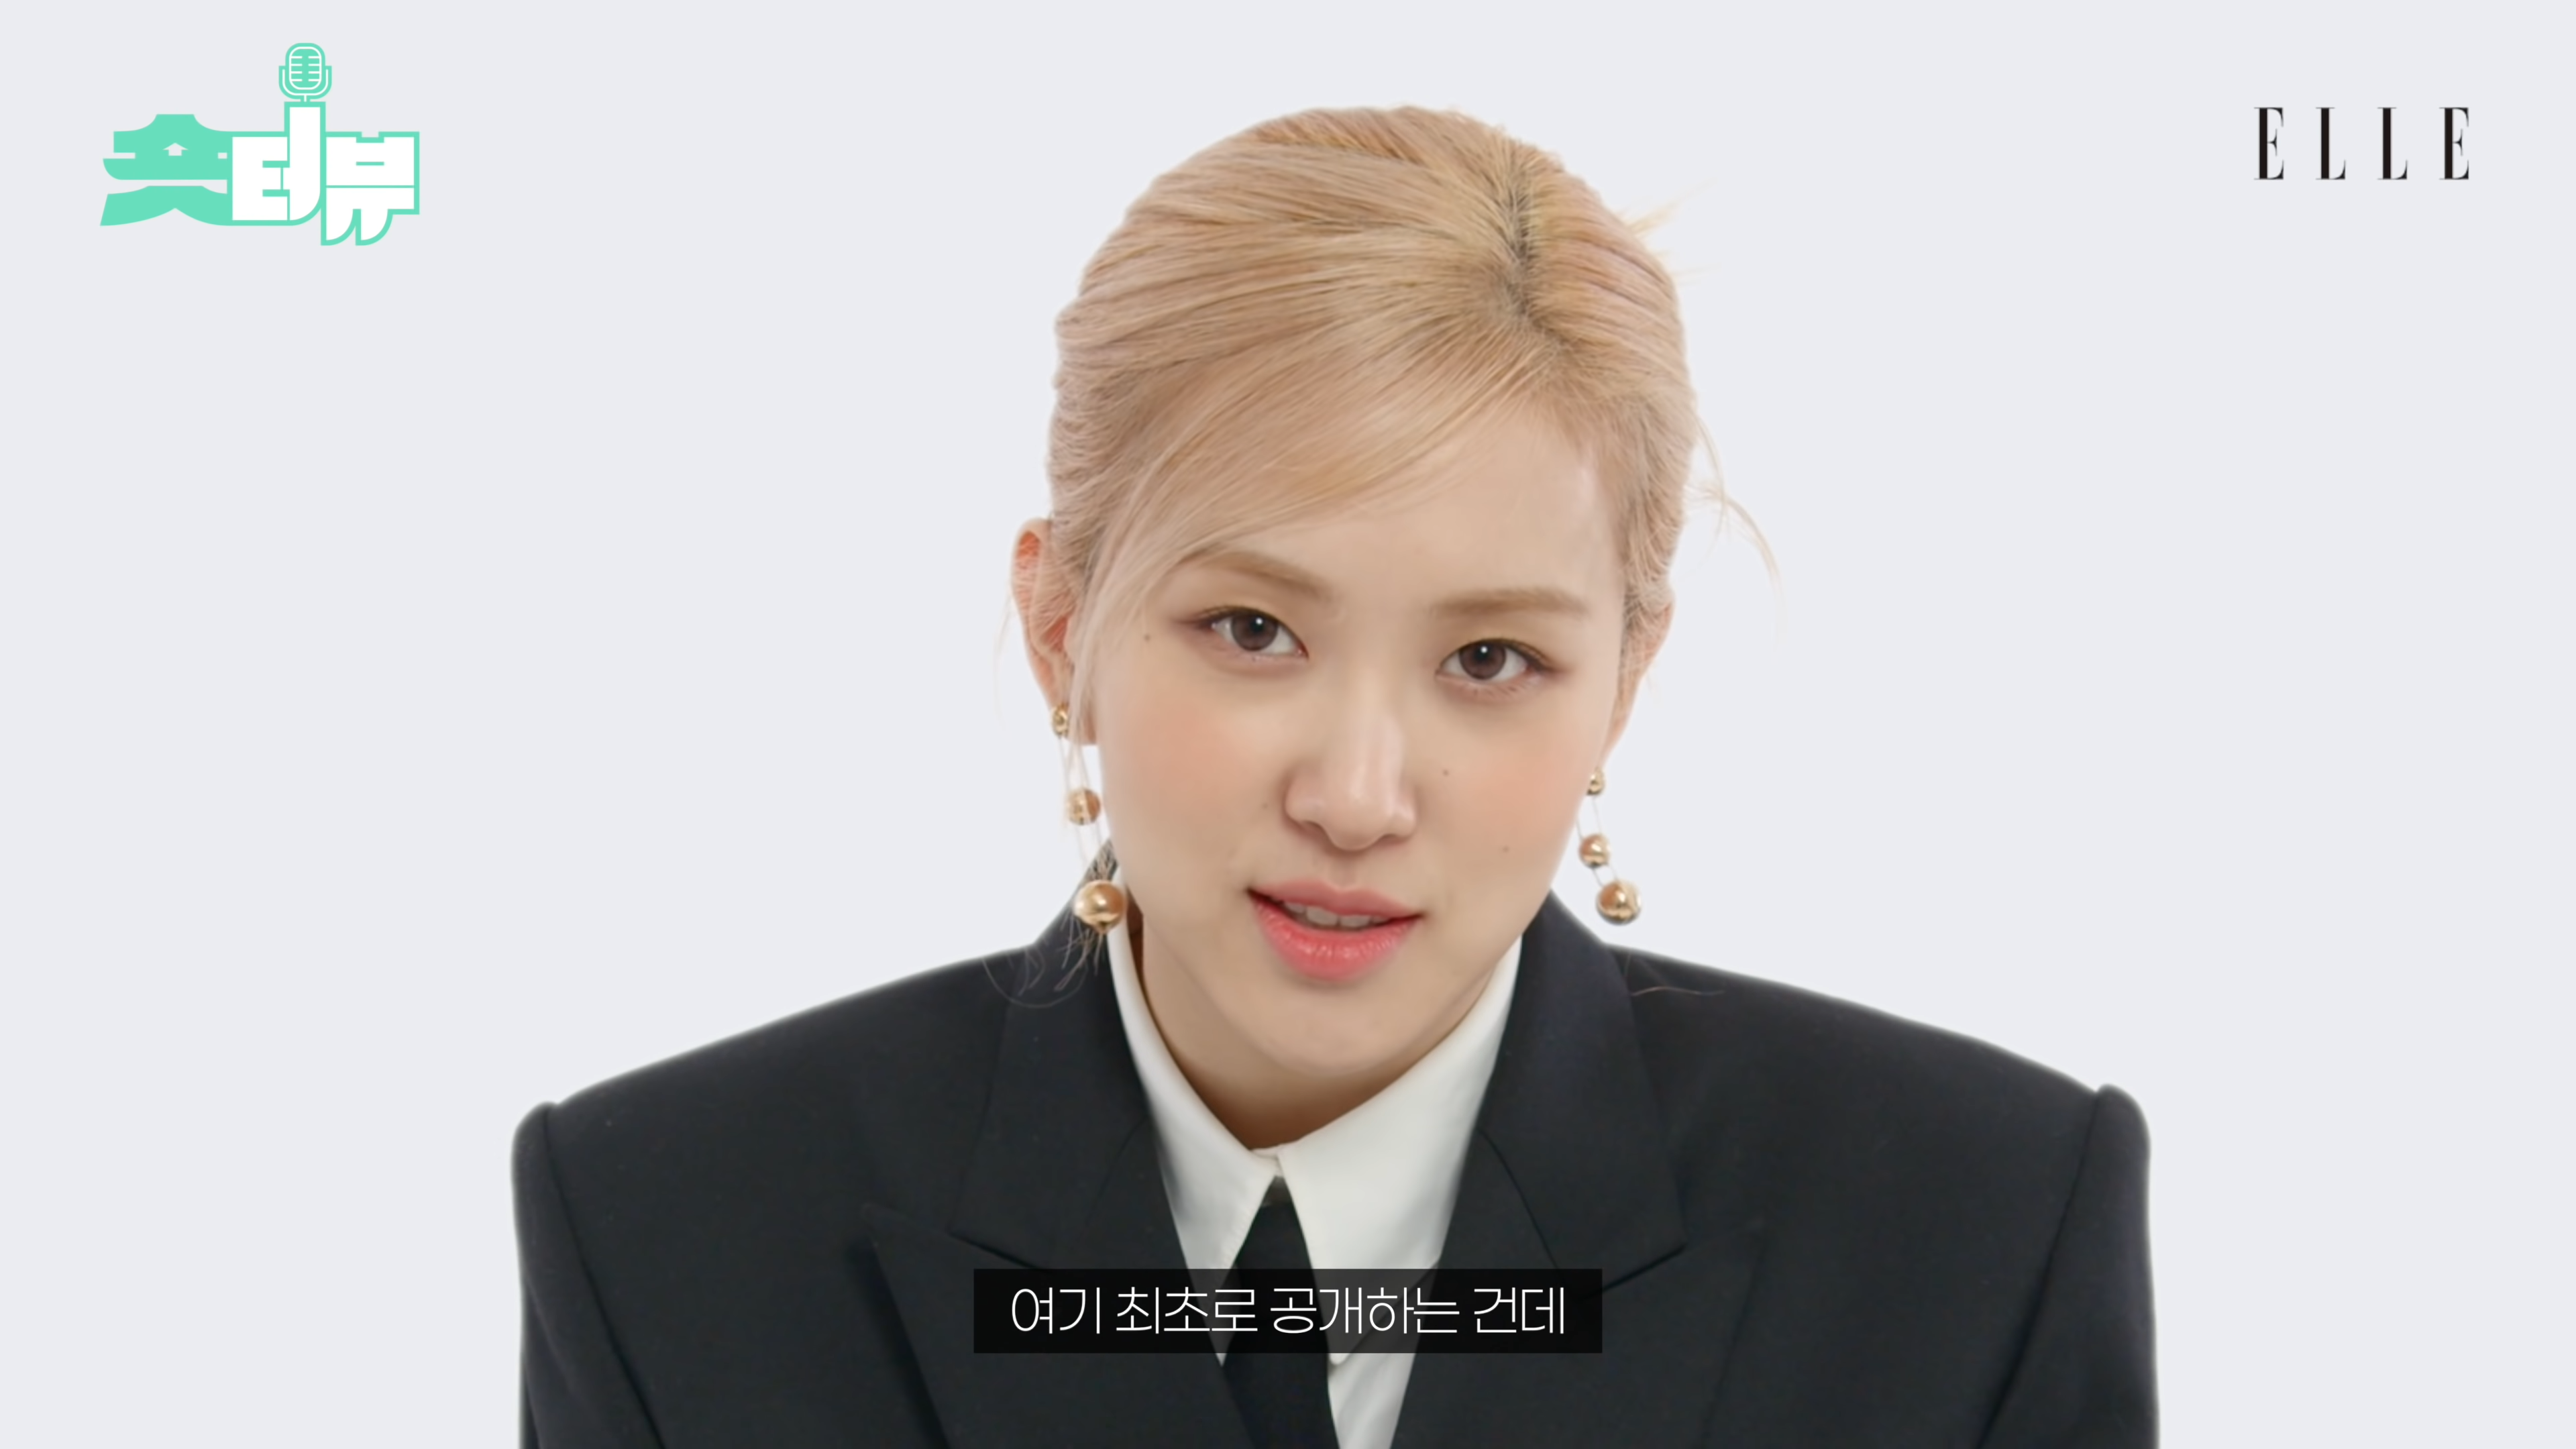 elle korea rose